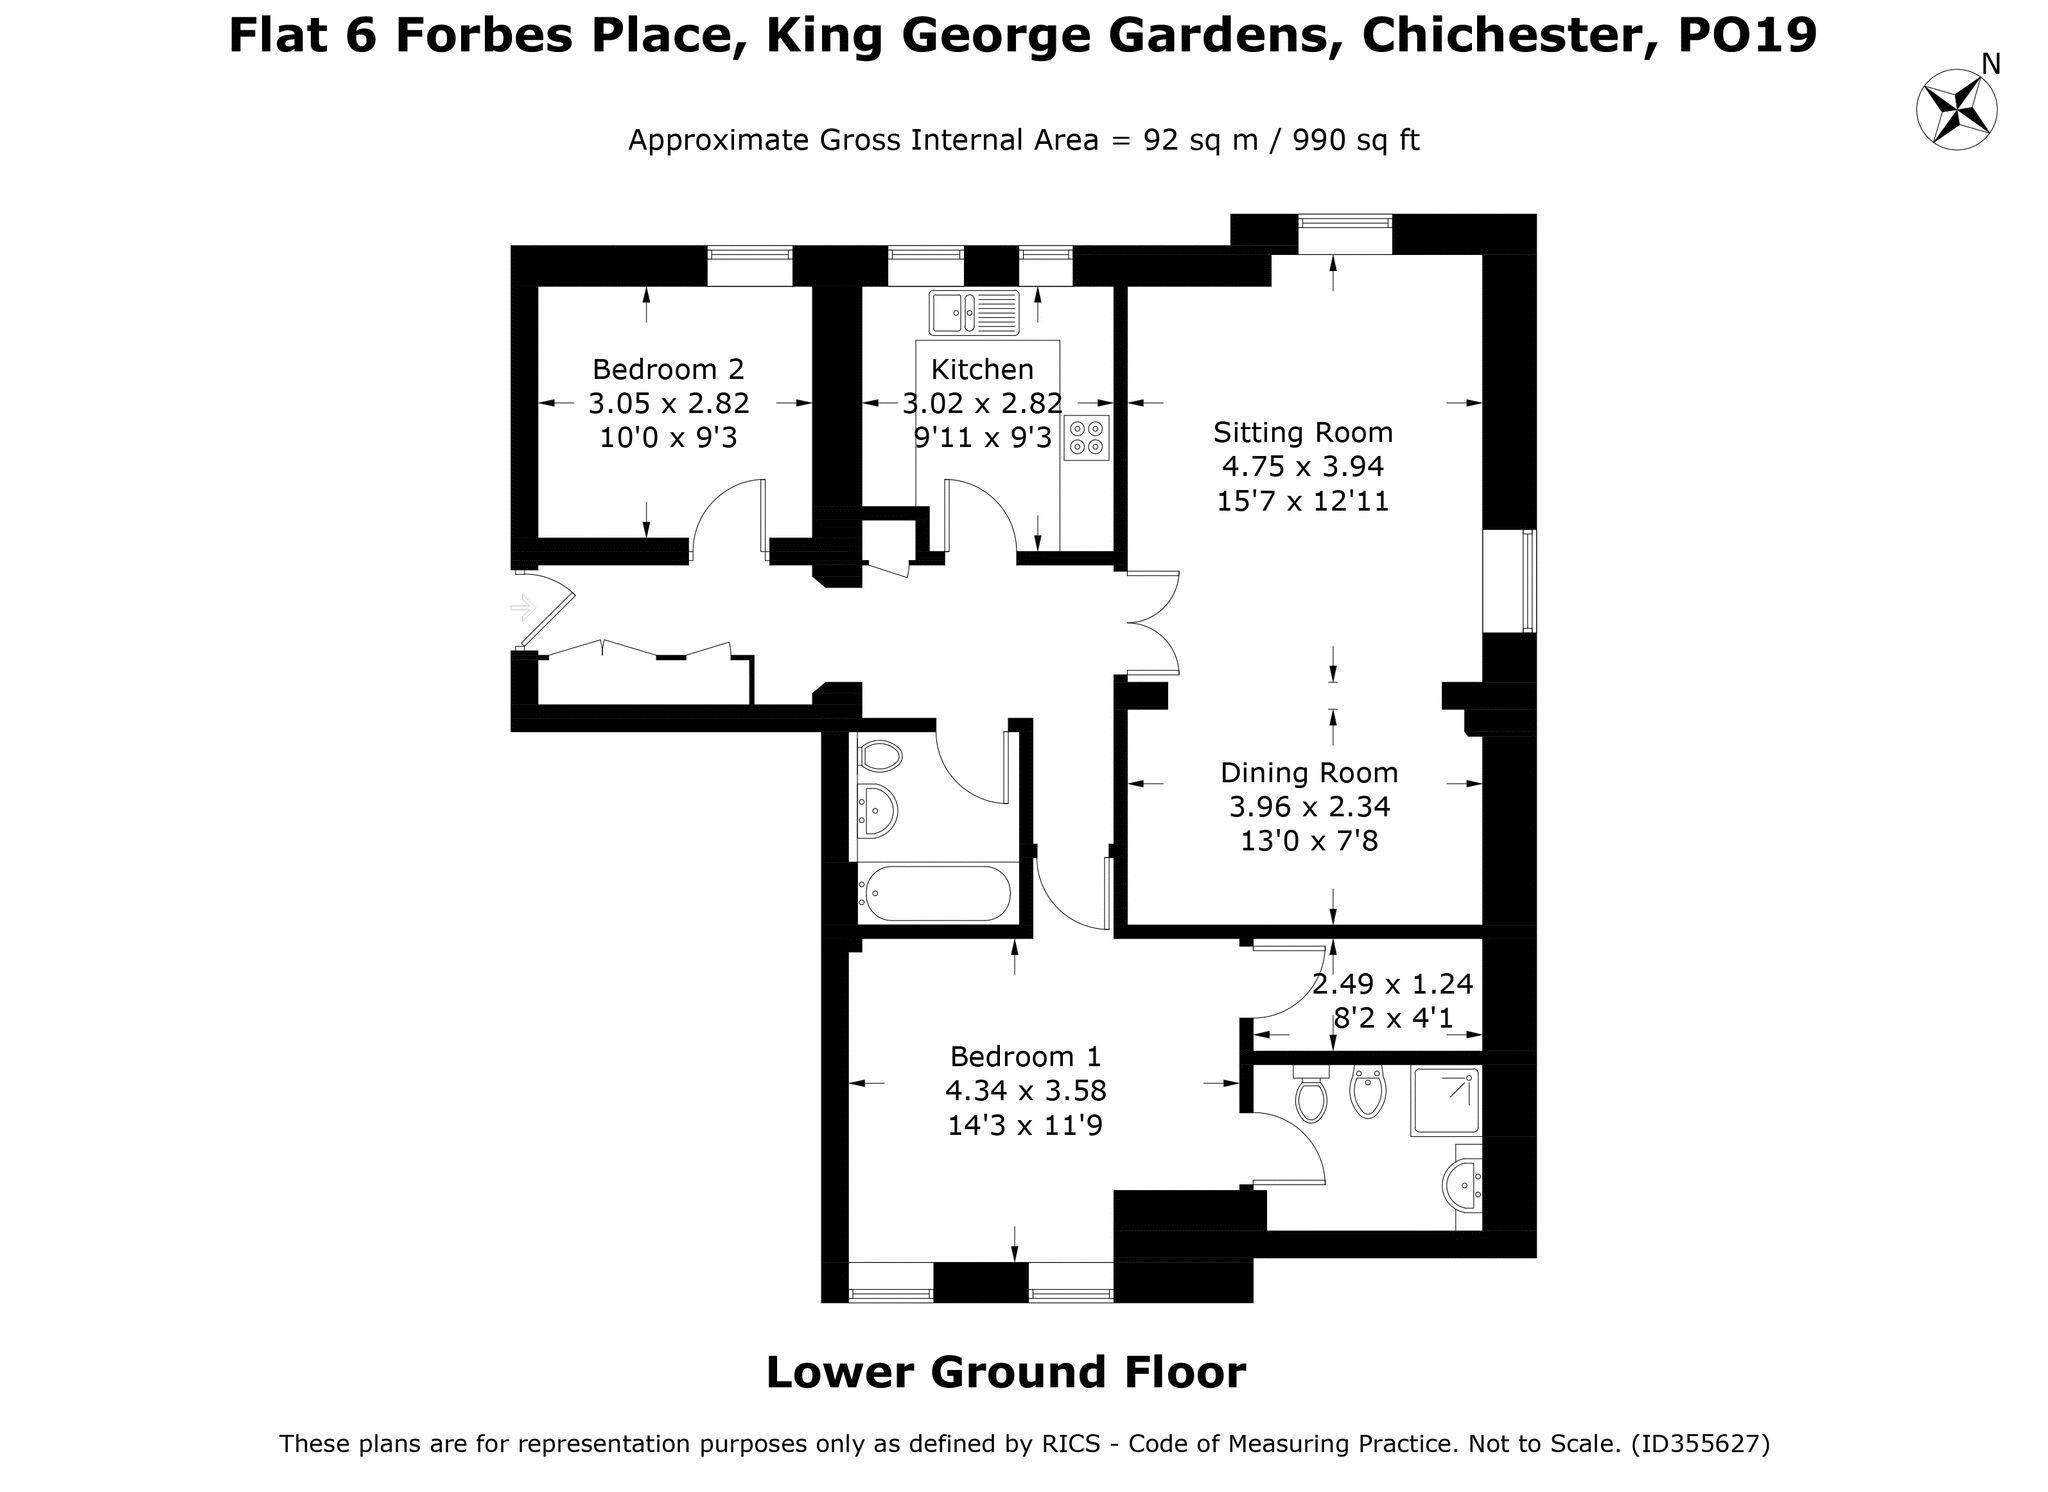 King George Gardens